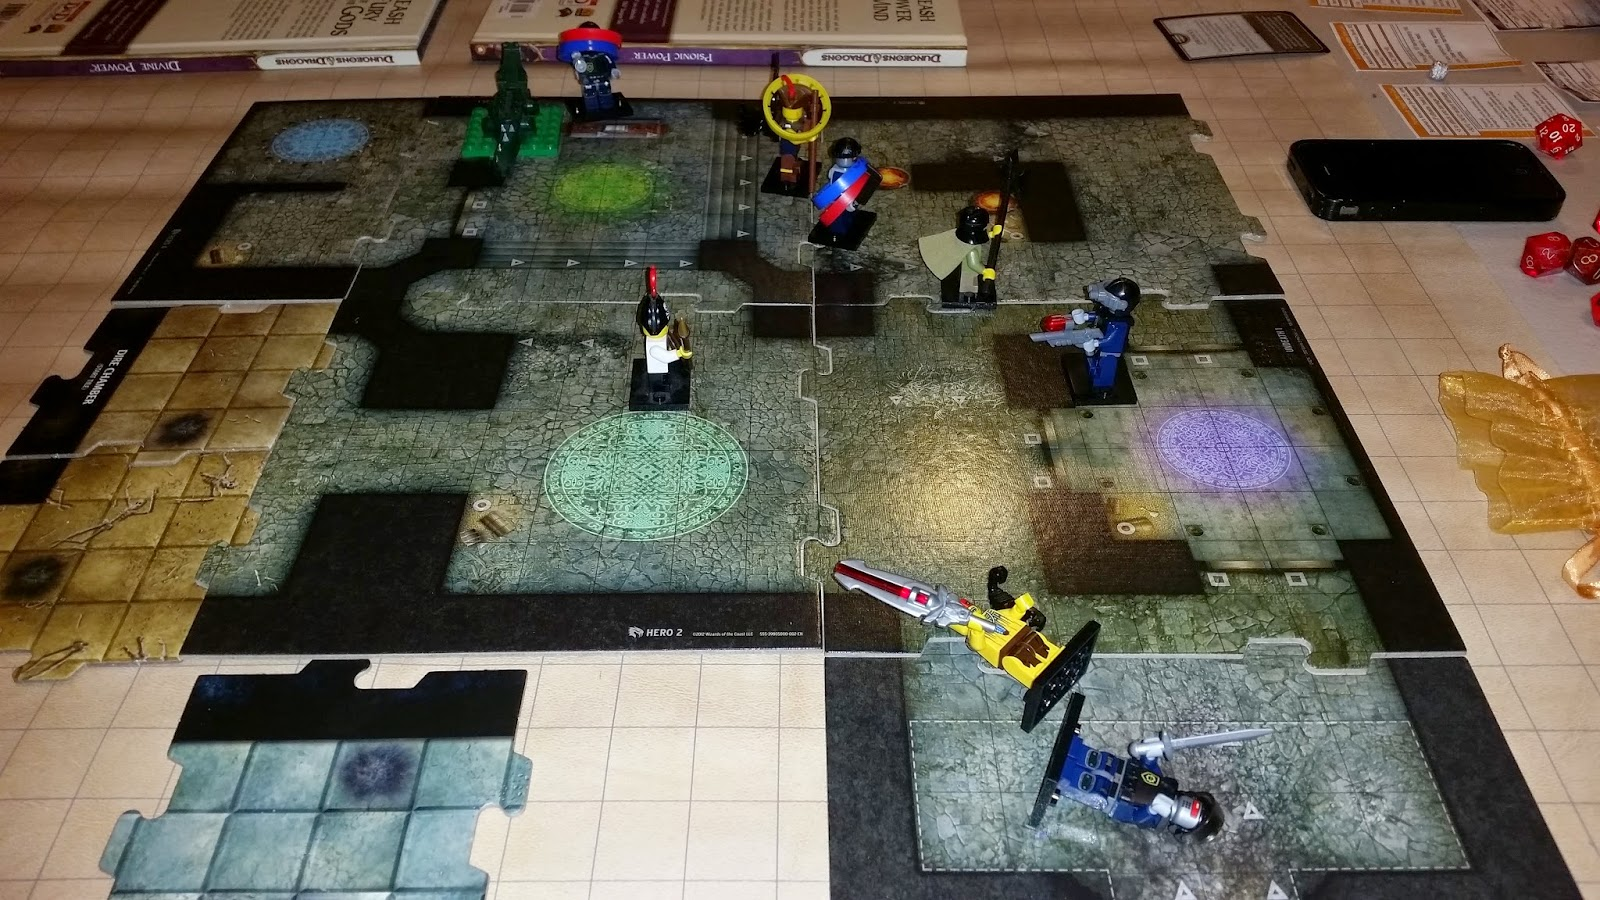 Warforged + LEGO = LEGO Movie Robo SWAT team!